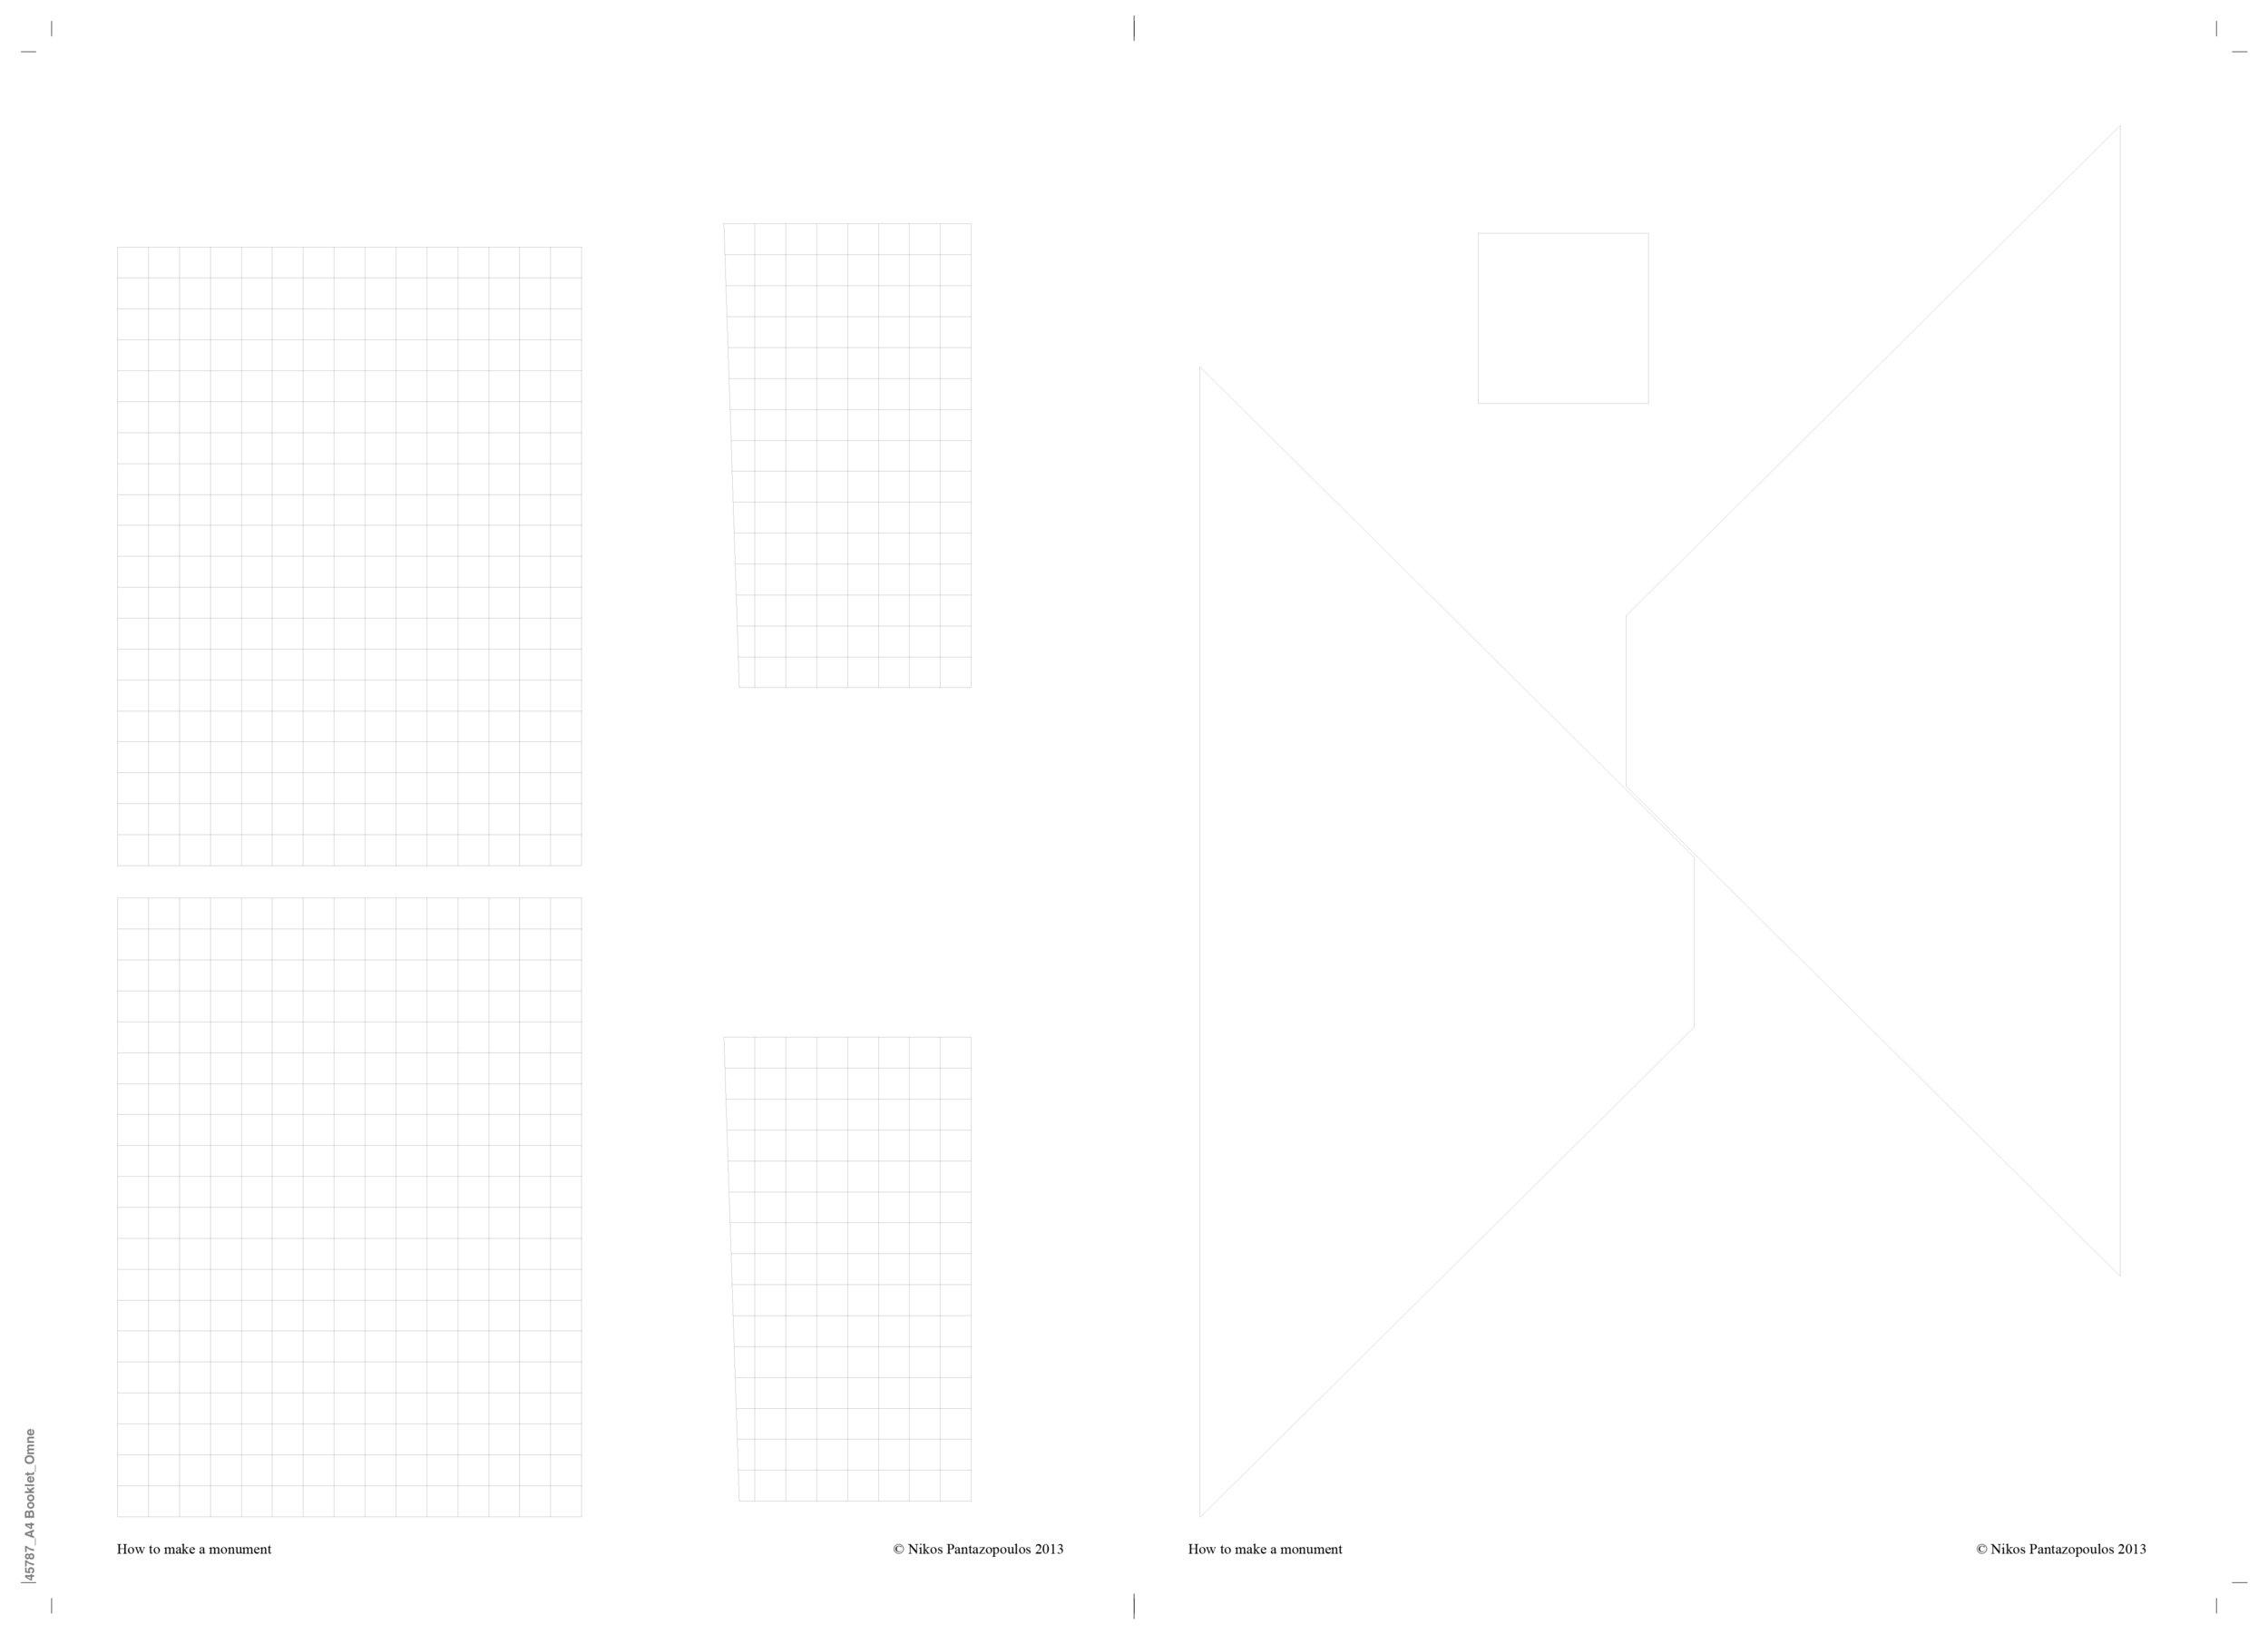 45787_A4 Booklet_Omne-6.jpg